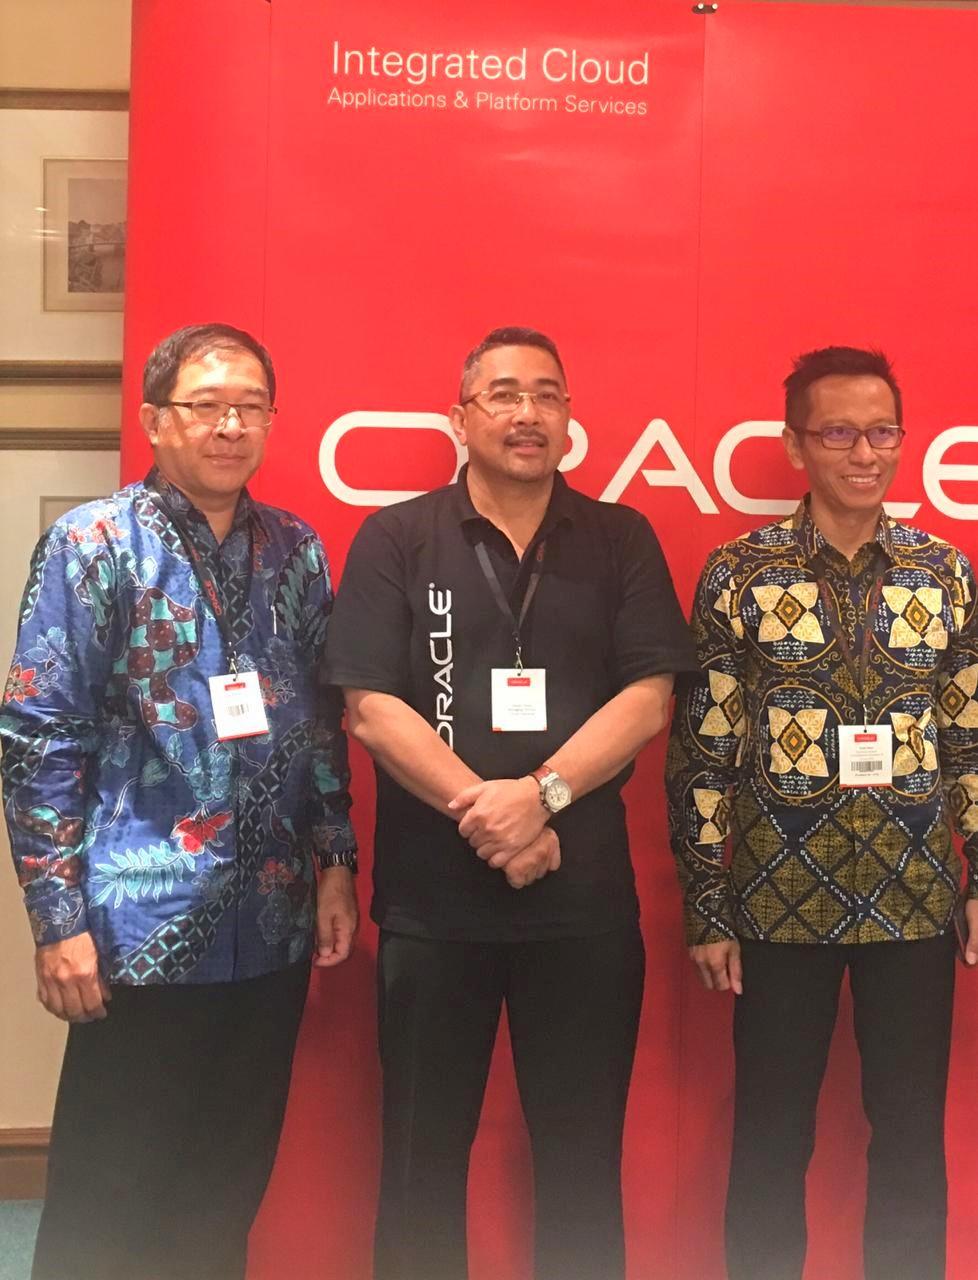 Wakil Presiden Teknologi PT. Tiki JNE Arief Rahardjo (kiri), Country Managing Director Oracle Indonesia Davian Omas (tengah), CIO Direktorat Jenderal Perbendaharaan Kementerian Keuangan Saiful Islam (kanan). - Oracle